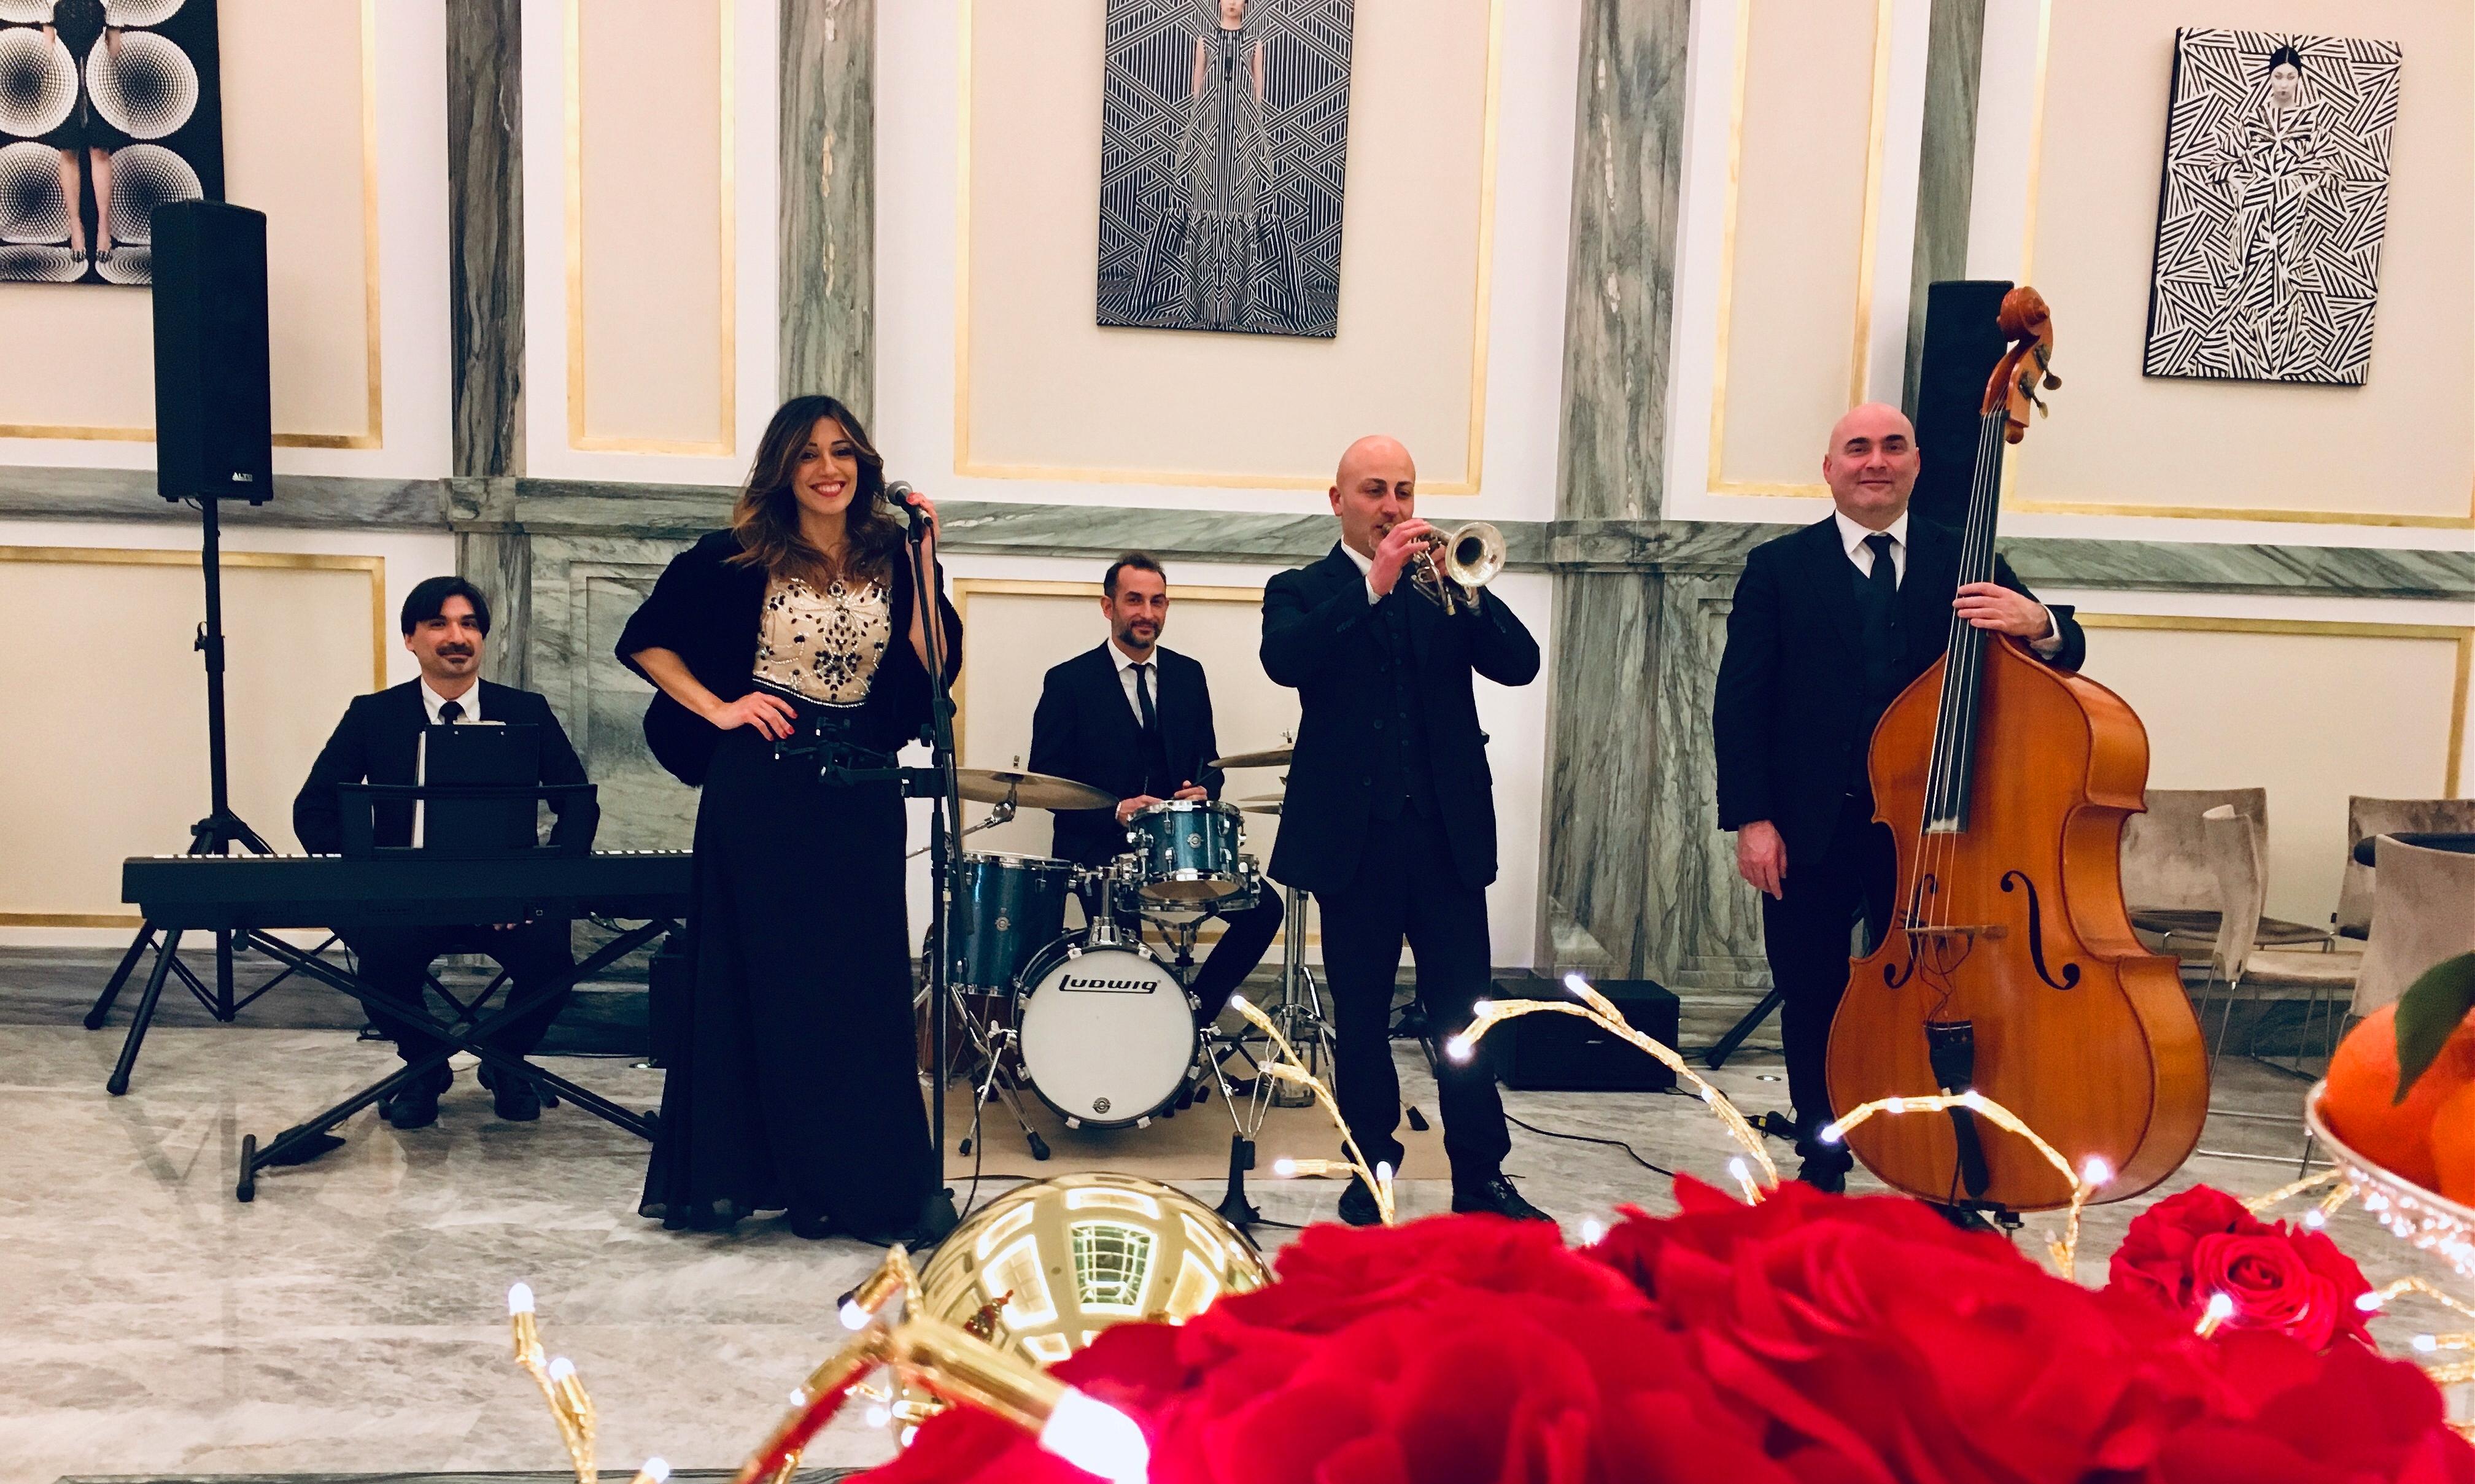 Gianluca Galvani Swing Band